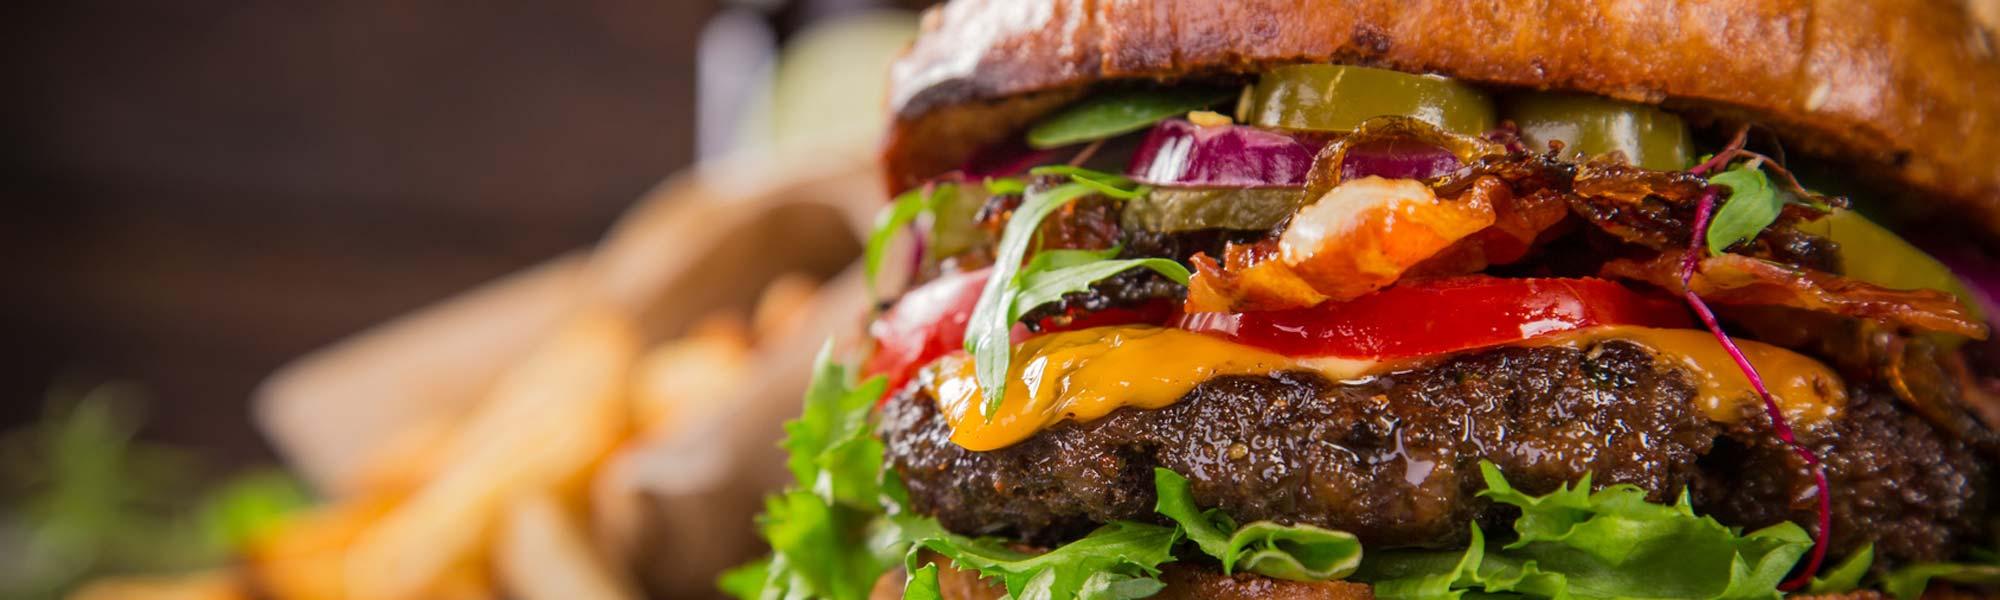 Fresh Burger